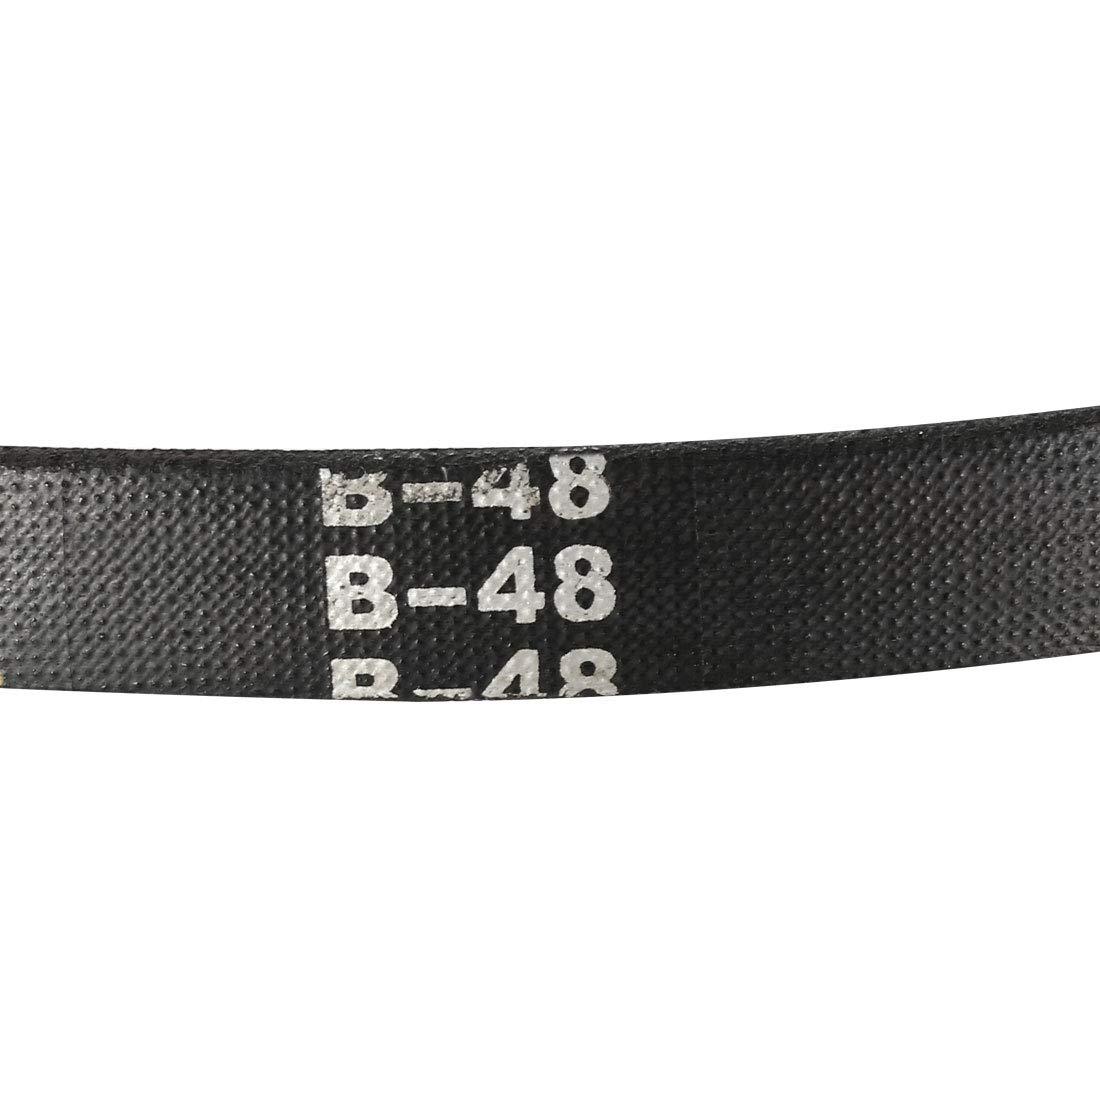 uxcell/® B47 Drive V-Belt Girth 47-inch Industrial Power Rubber Transmission Belt